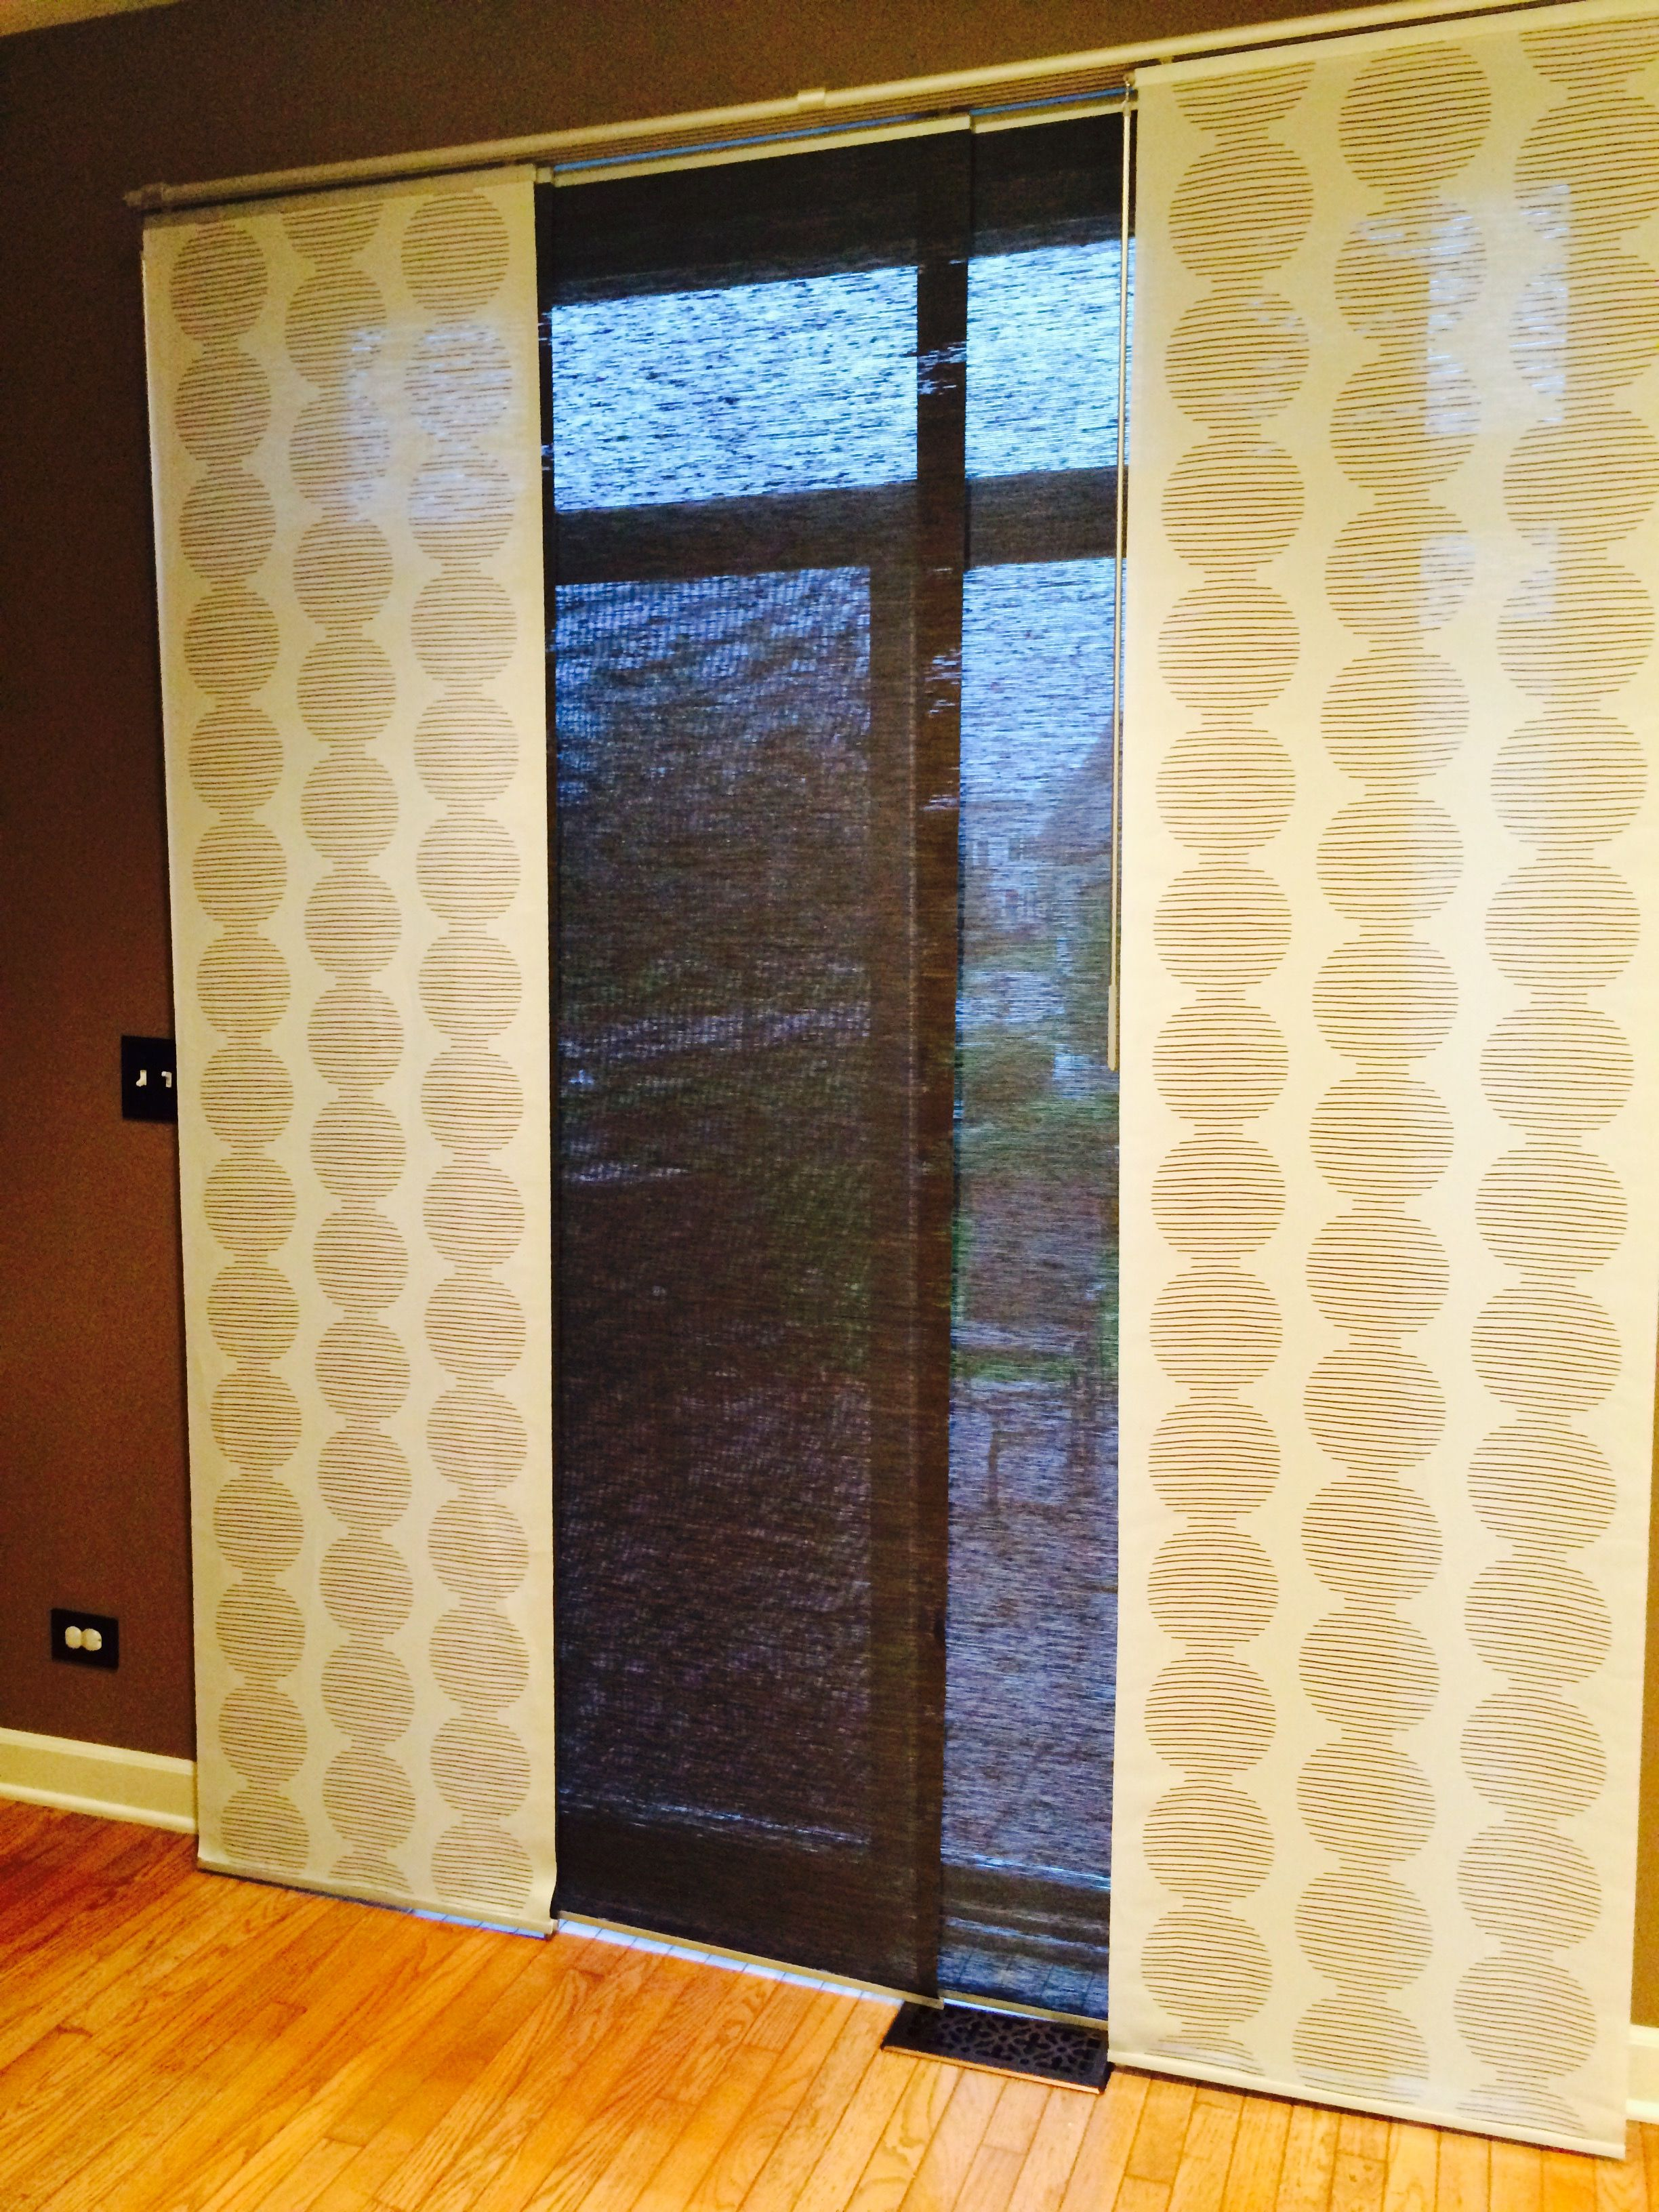 Ikea Kvartal Curtain In 2020: IKEA Kvartal Sliding Curtain Panel. 3, Triple Rods And 6